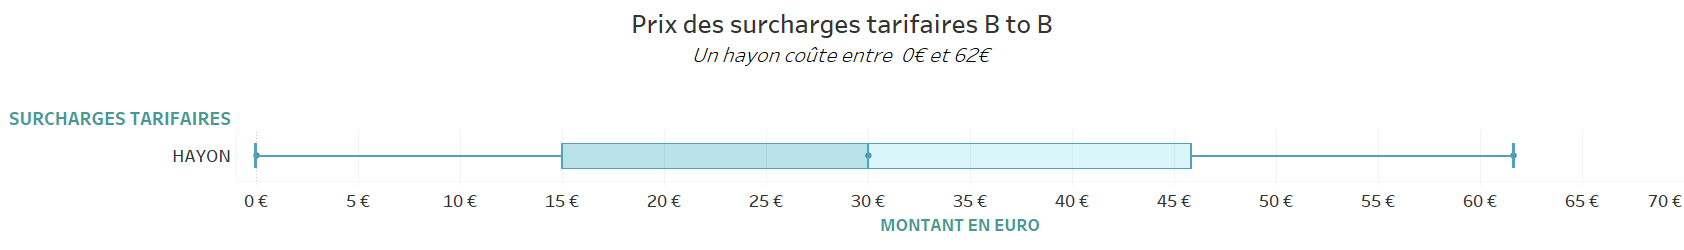 surcharge-tarifaire-hayon